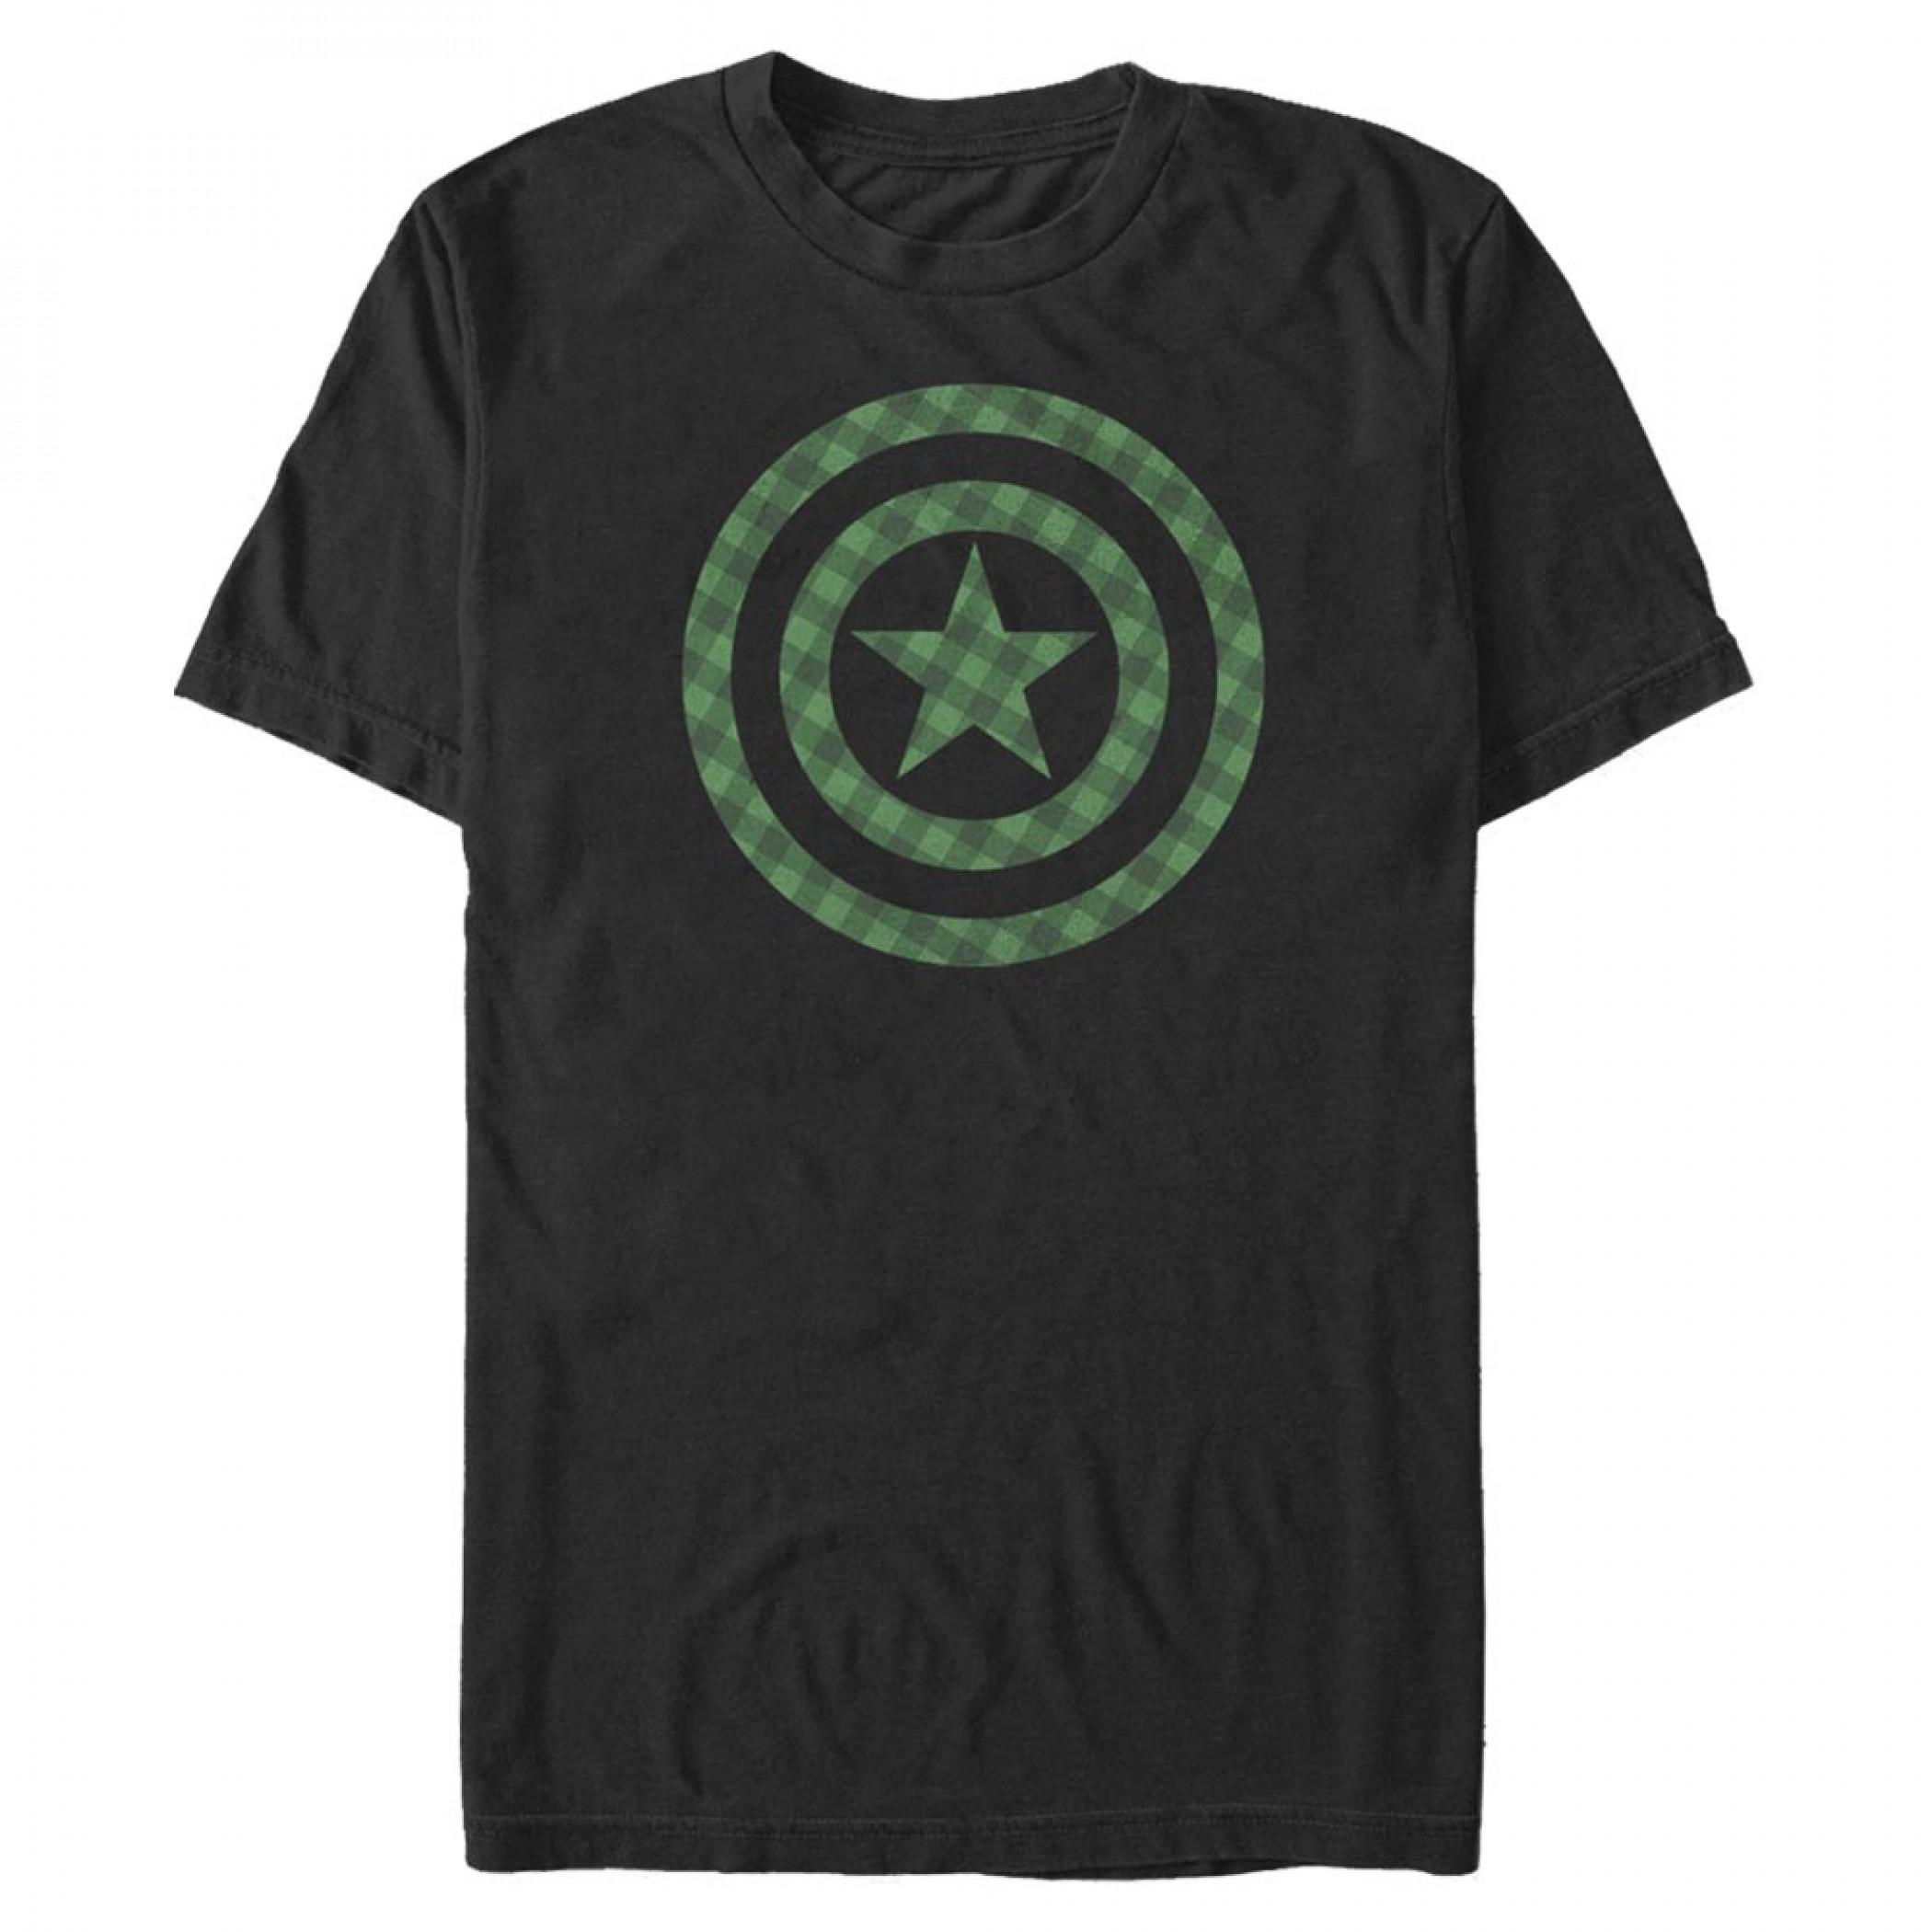 Captain America St. Patrick's Day T-Shirt